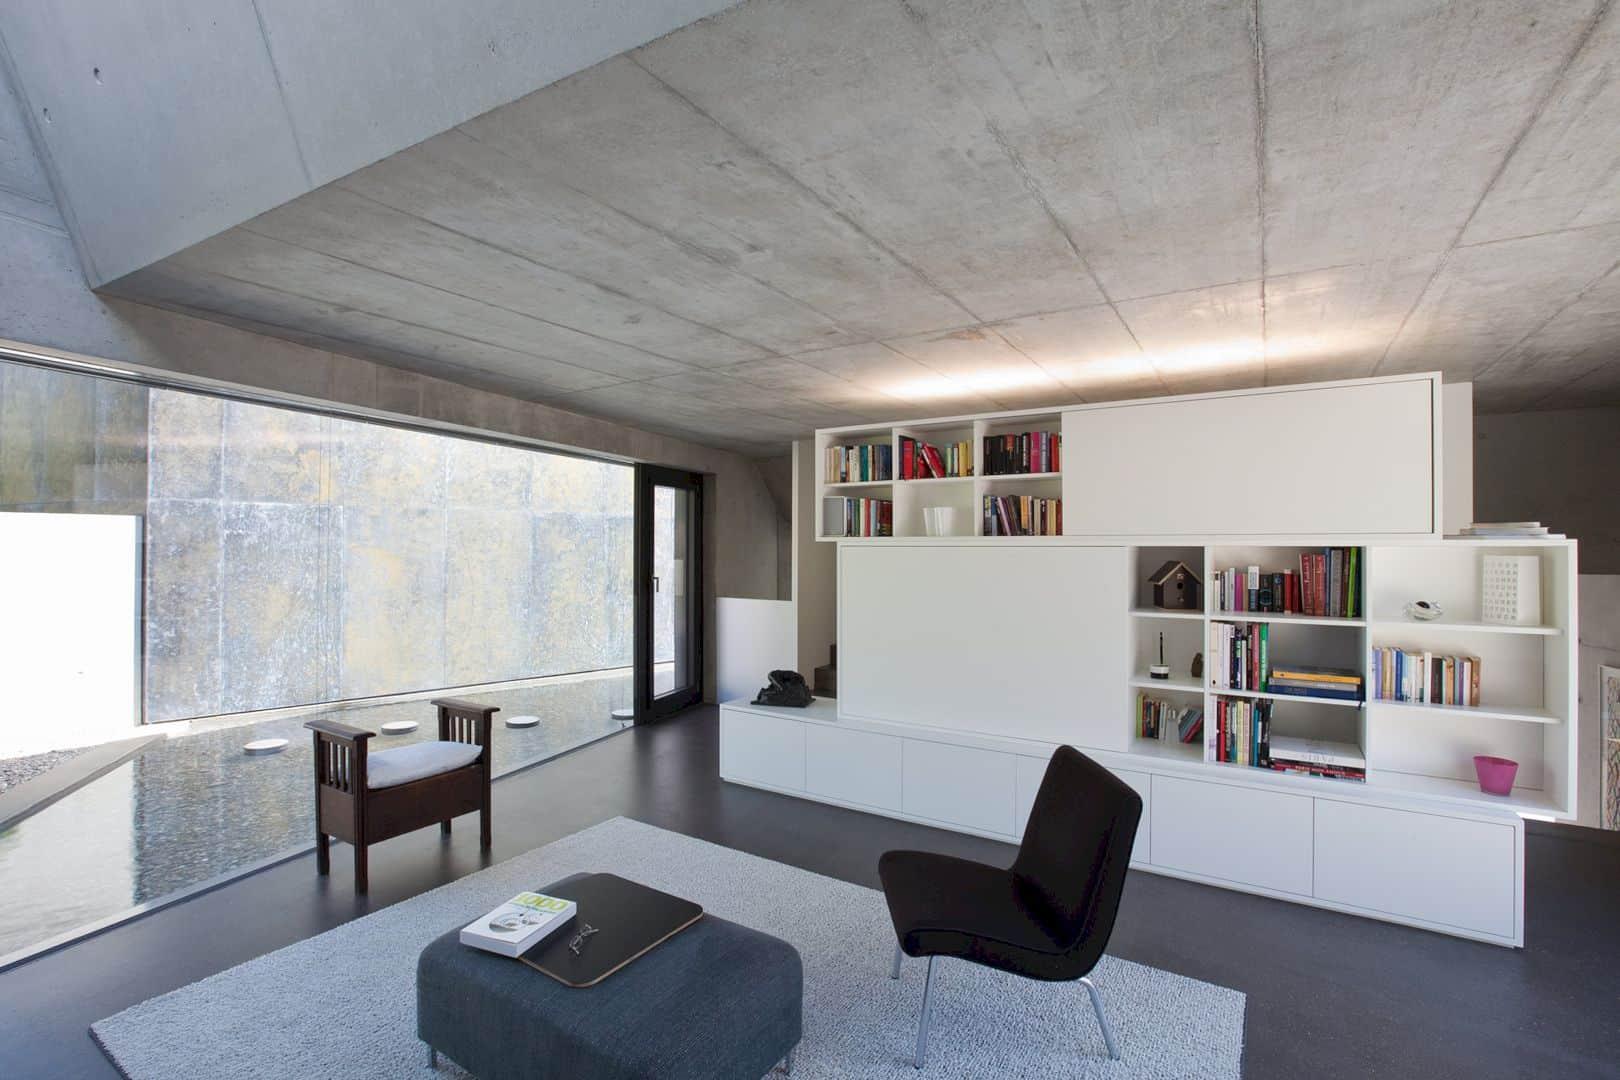 2 EFH Wingert Oberweningen By L3P Architekten 8